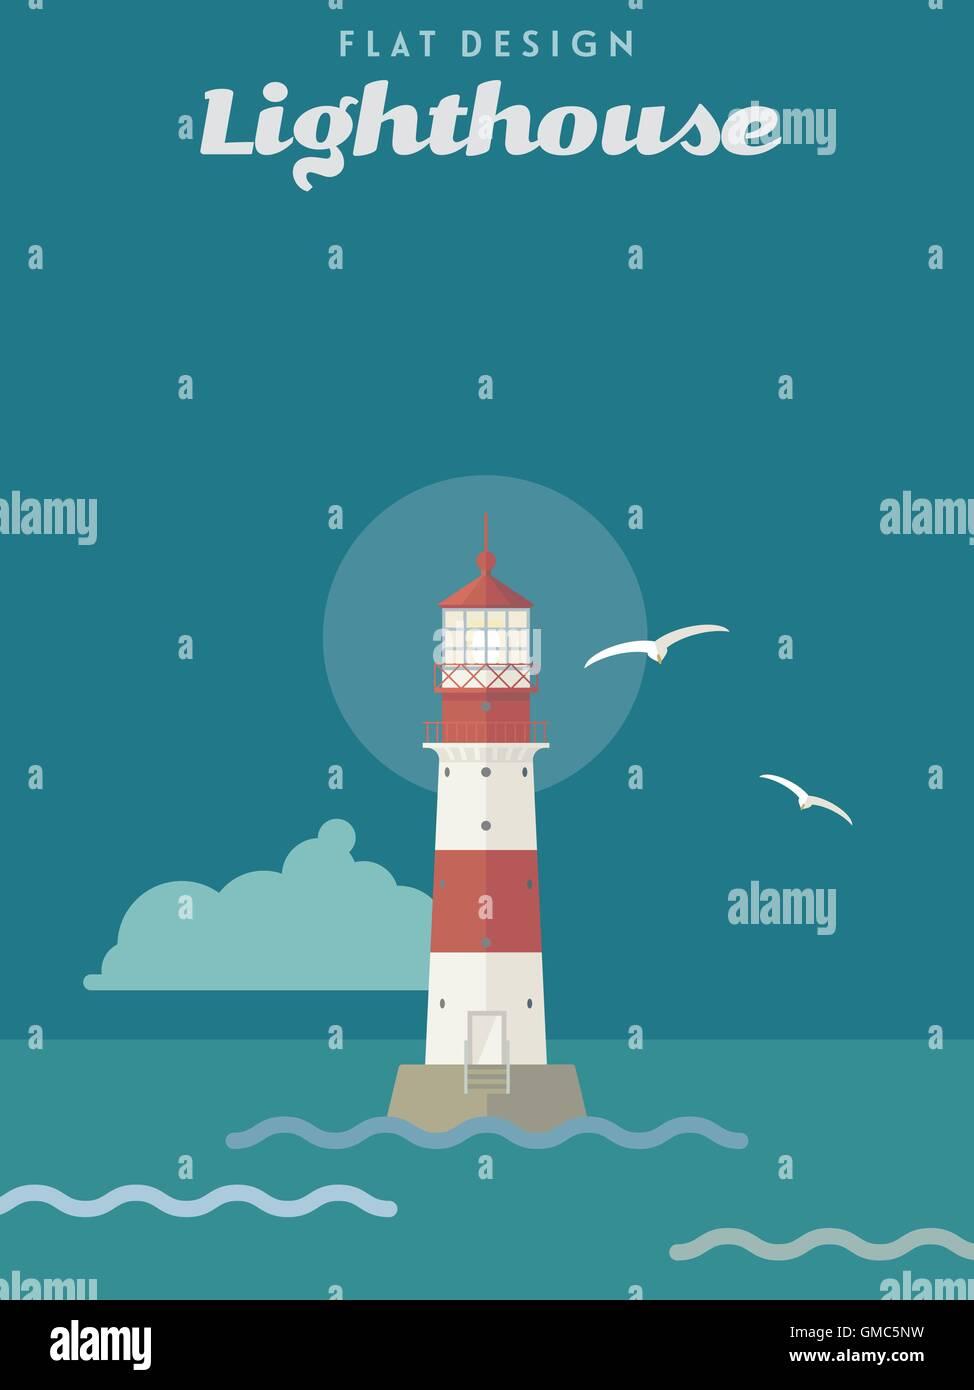 Vector illustration of illuminated lighthouse, flat design - Stock Image